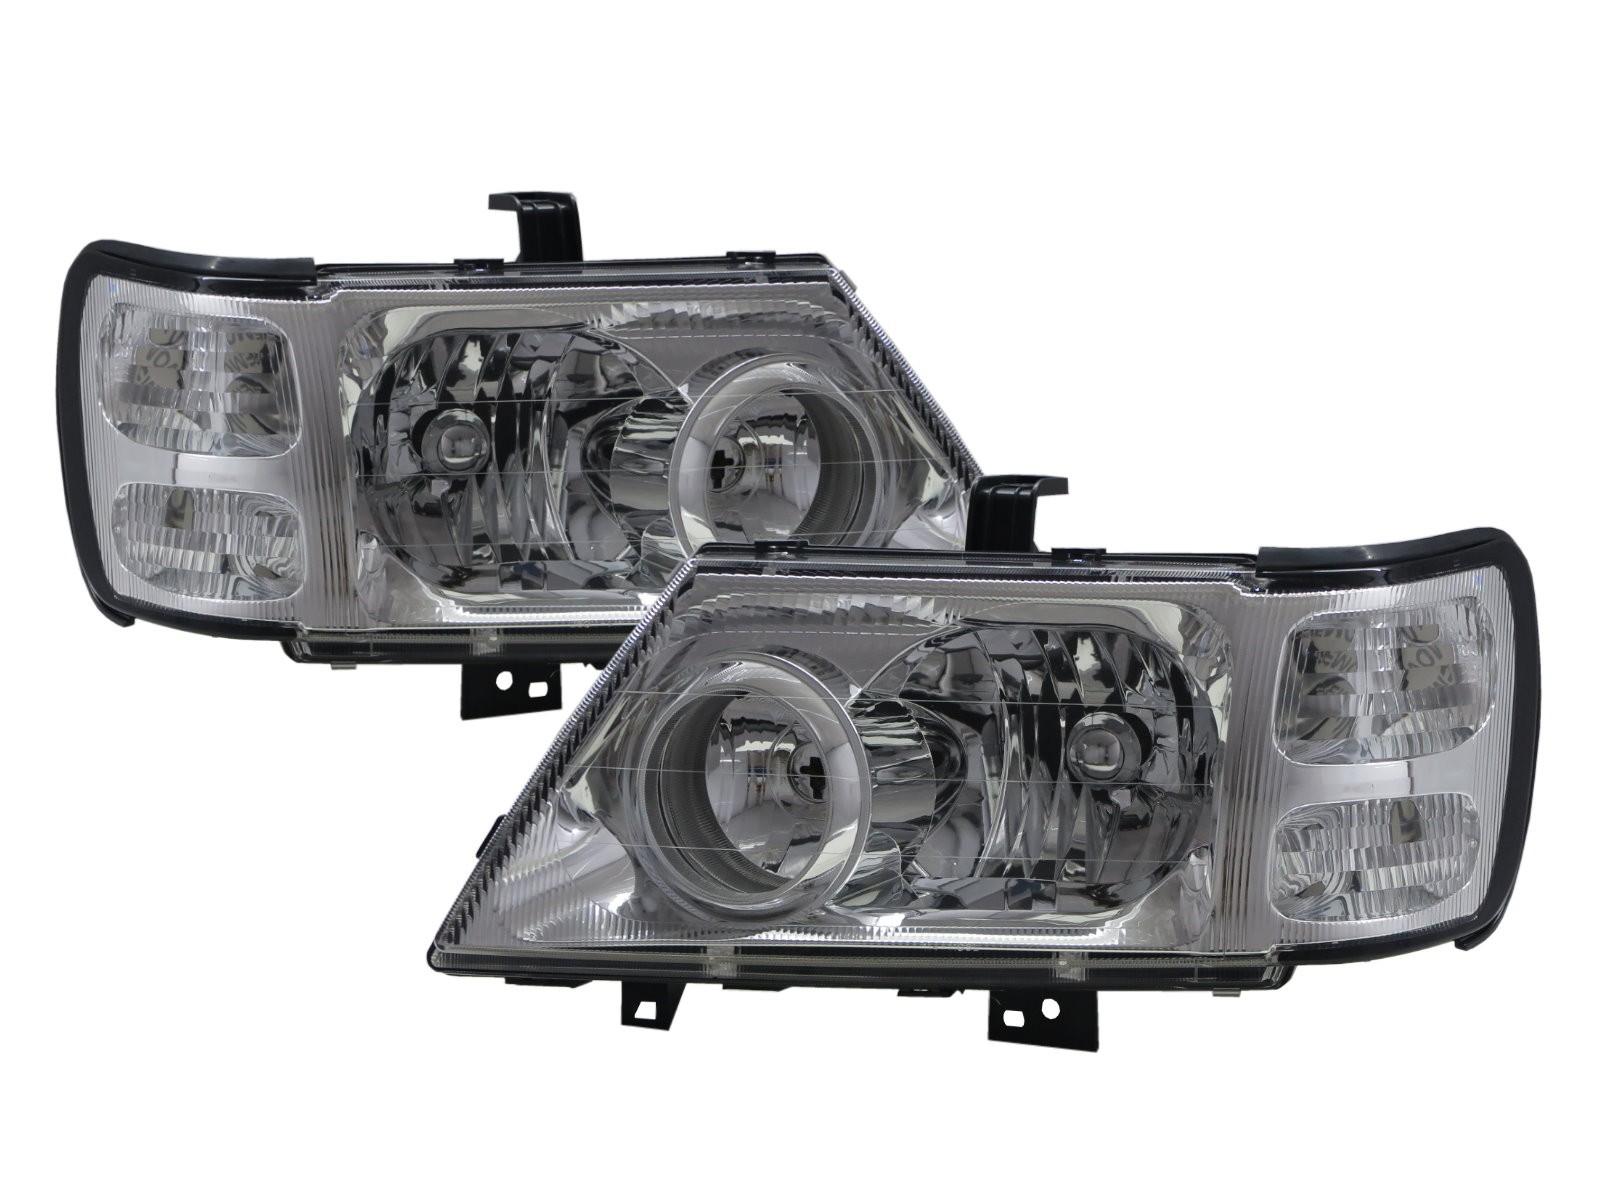 CrazyTheGod Jolie 2001-2003 Wagon/Truck 2D/5D Clear Headlight Headlamp Chrome for Mitsubishi LHD